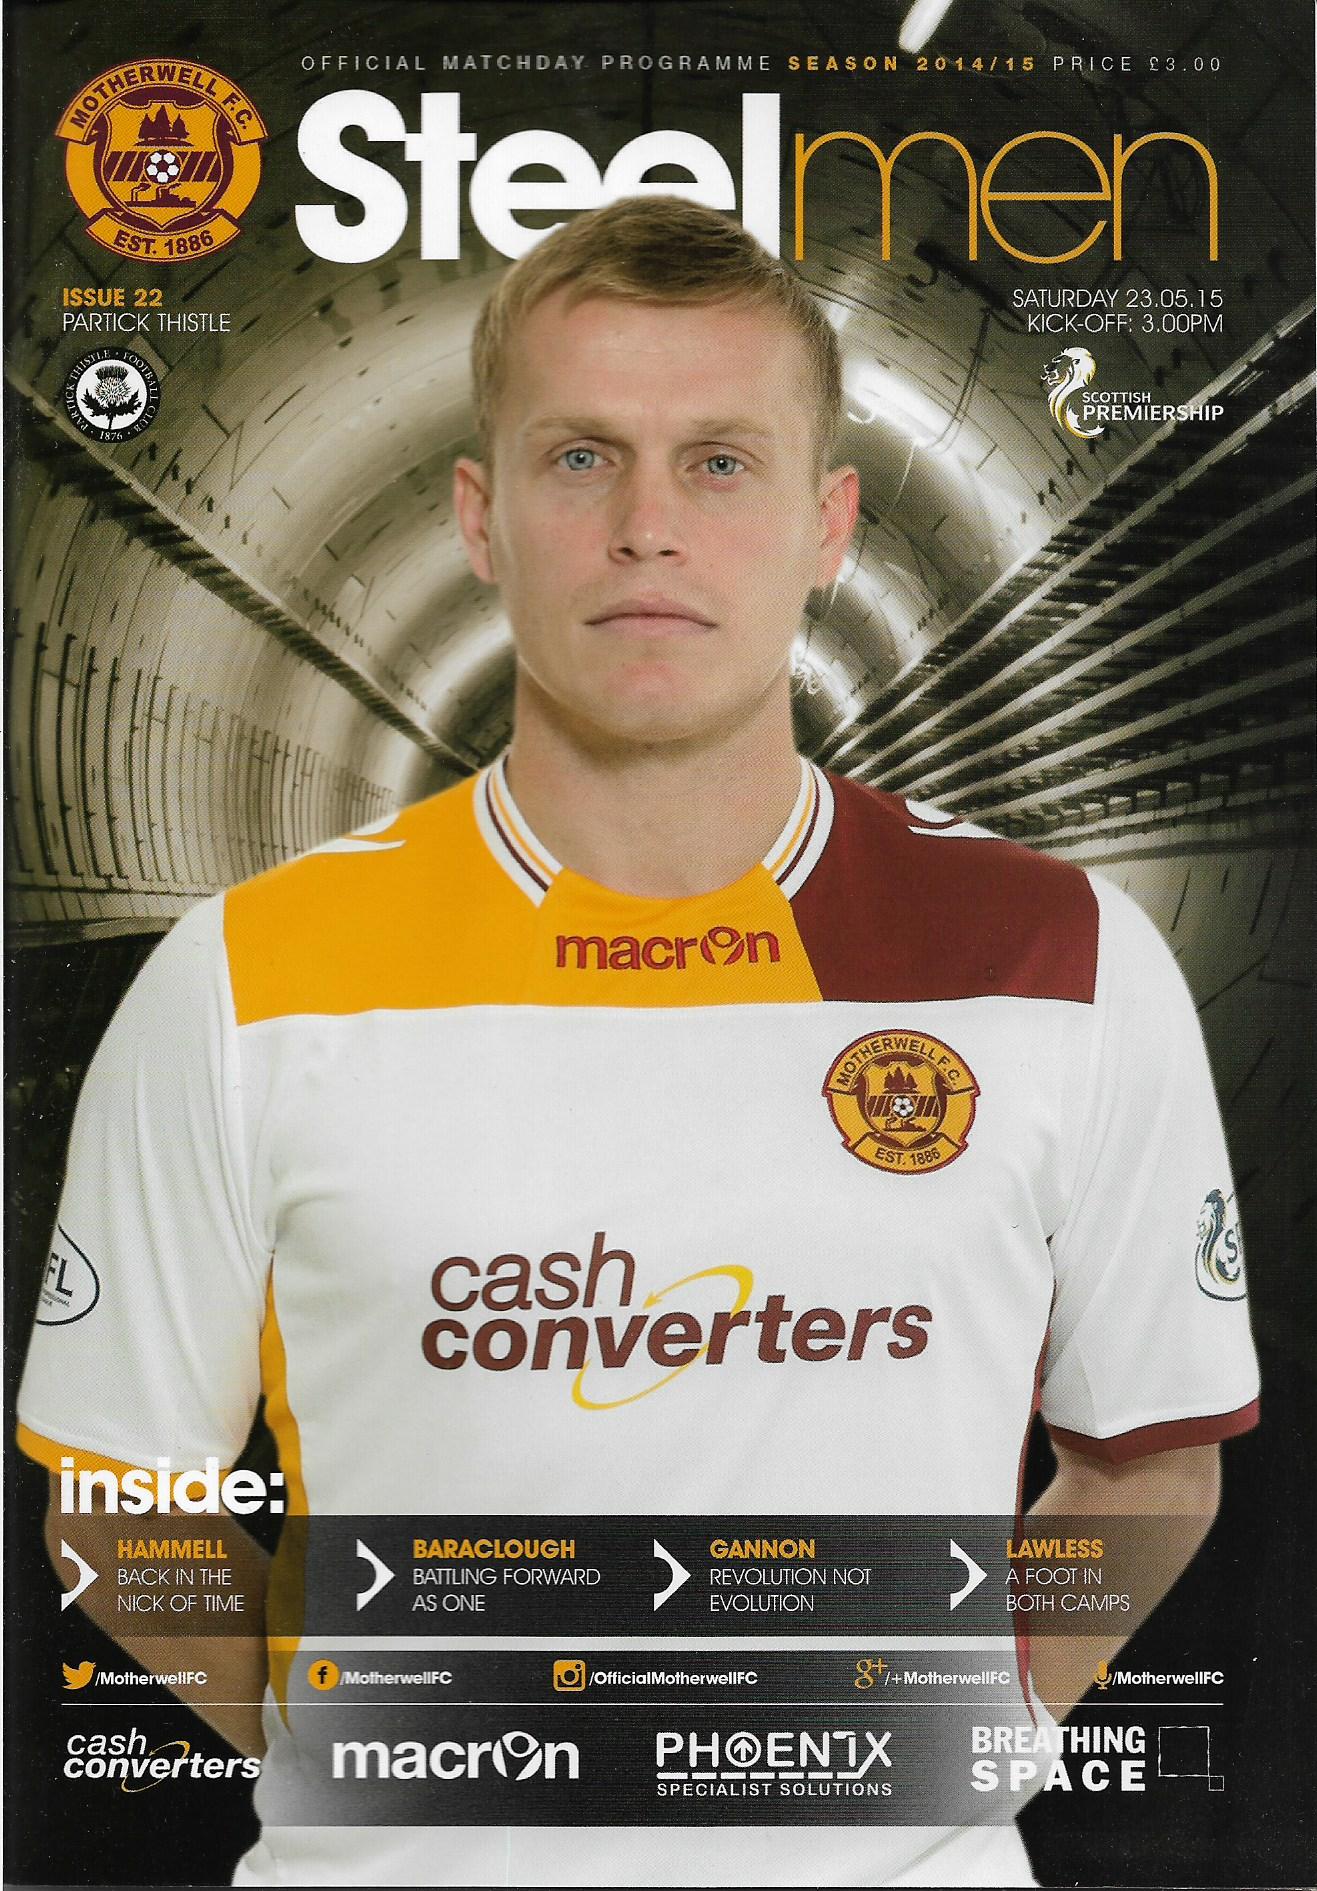 Programme Cover 2014/15 Season